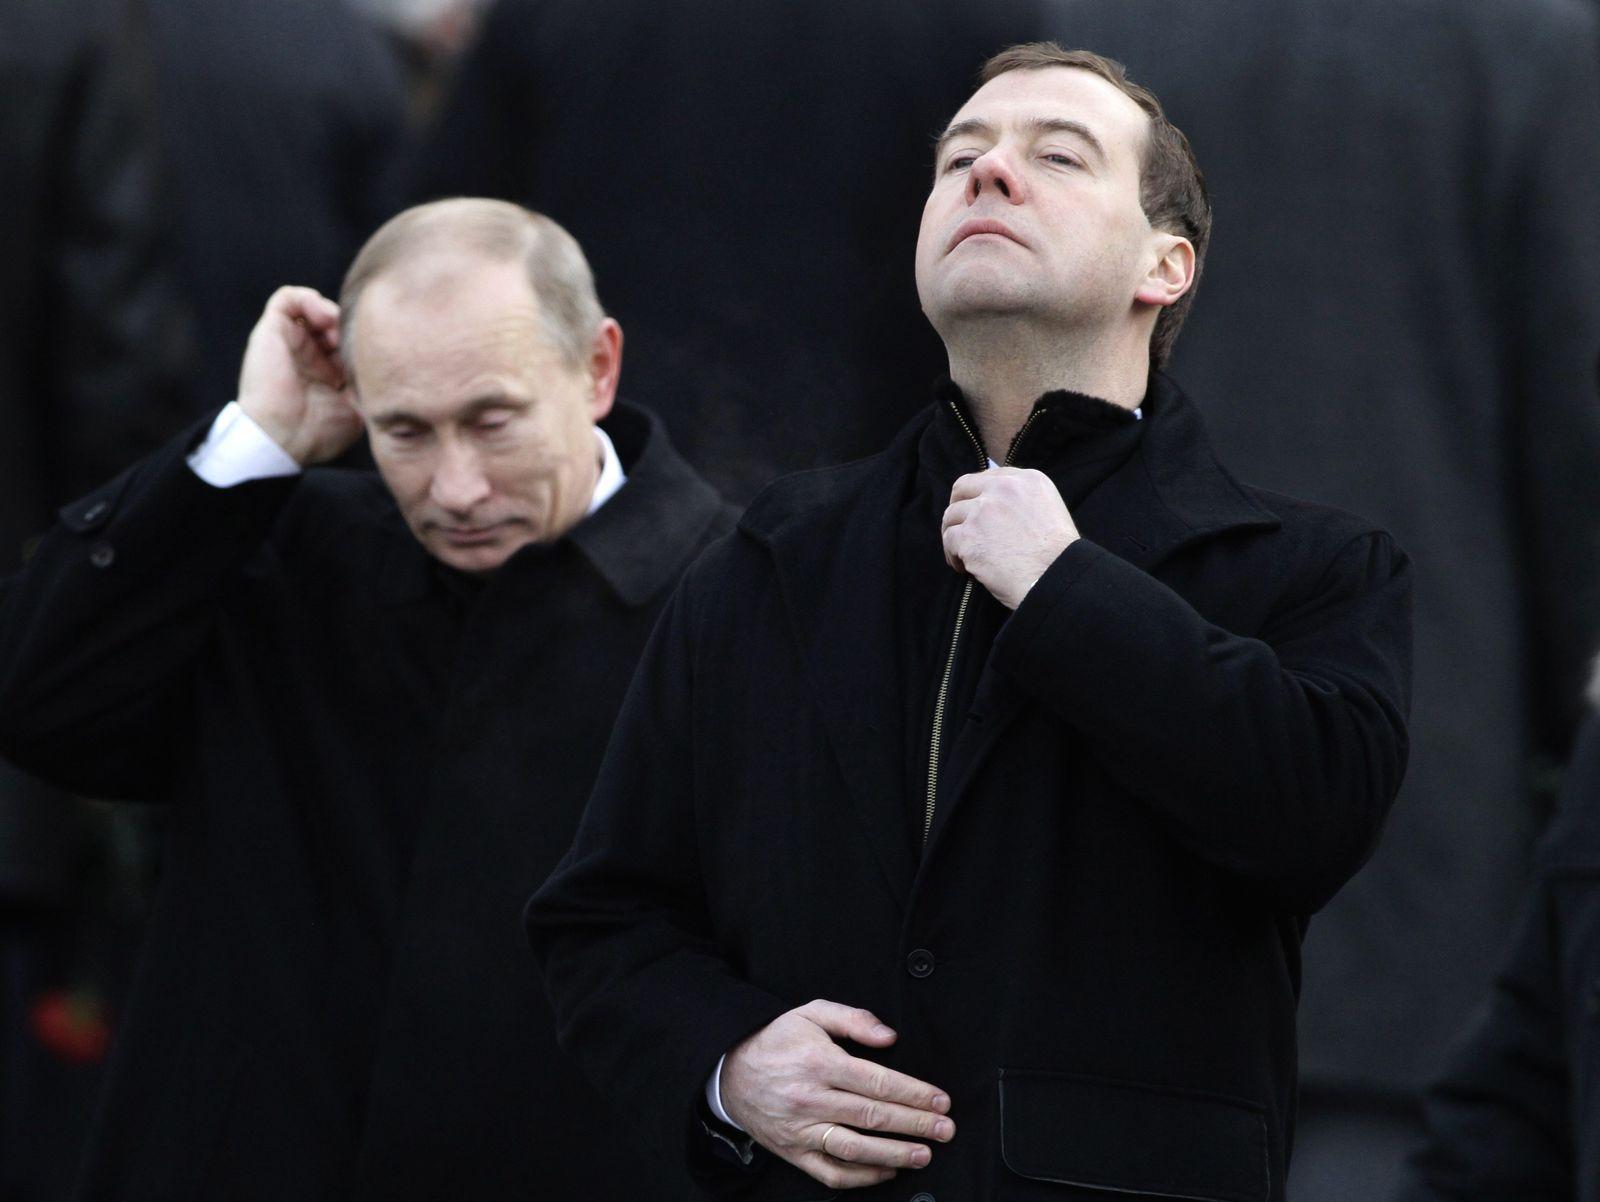 Putin Medwedew